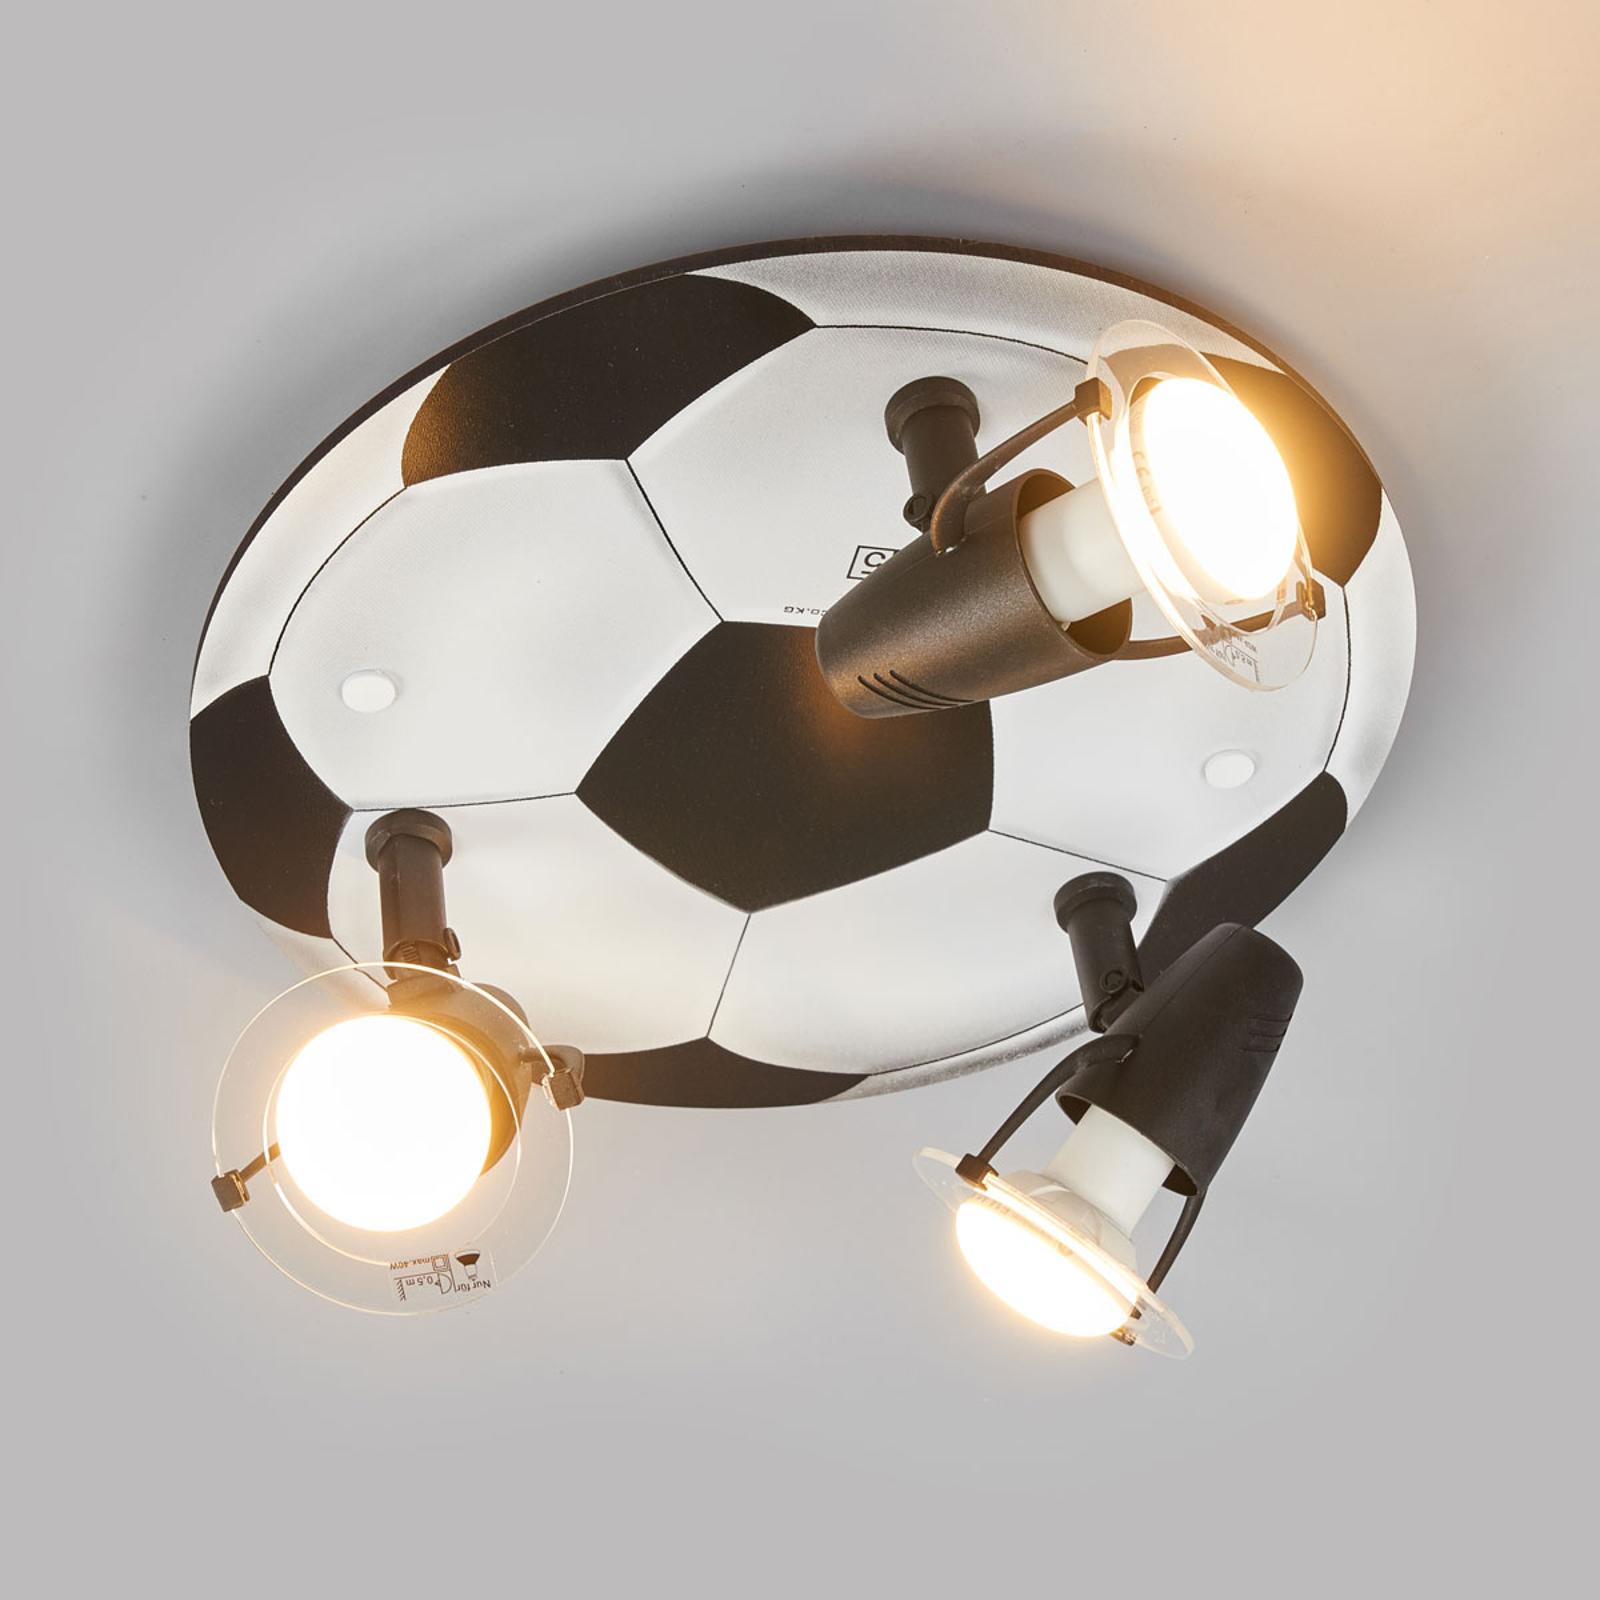 ALEXANDRA FOTBALL taklampe med tre lys